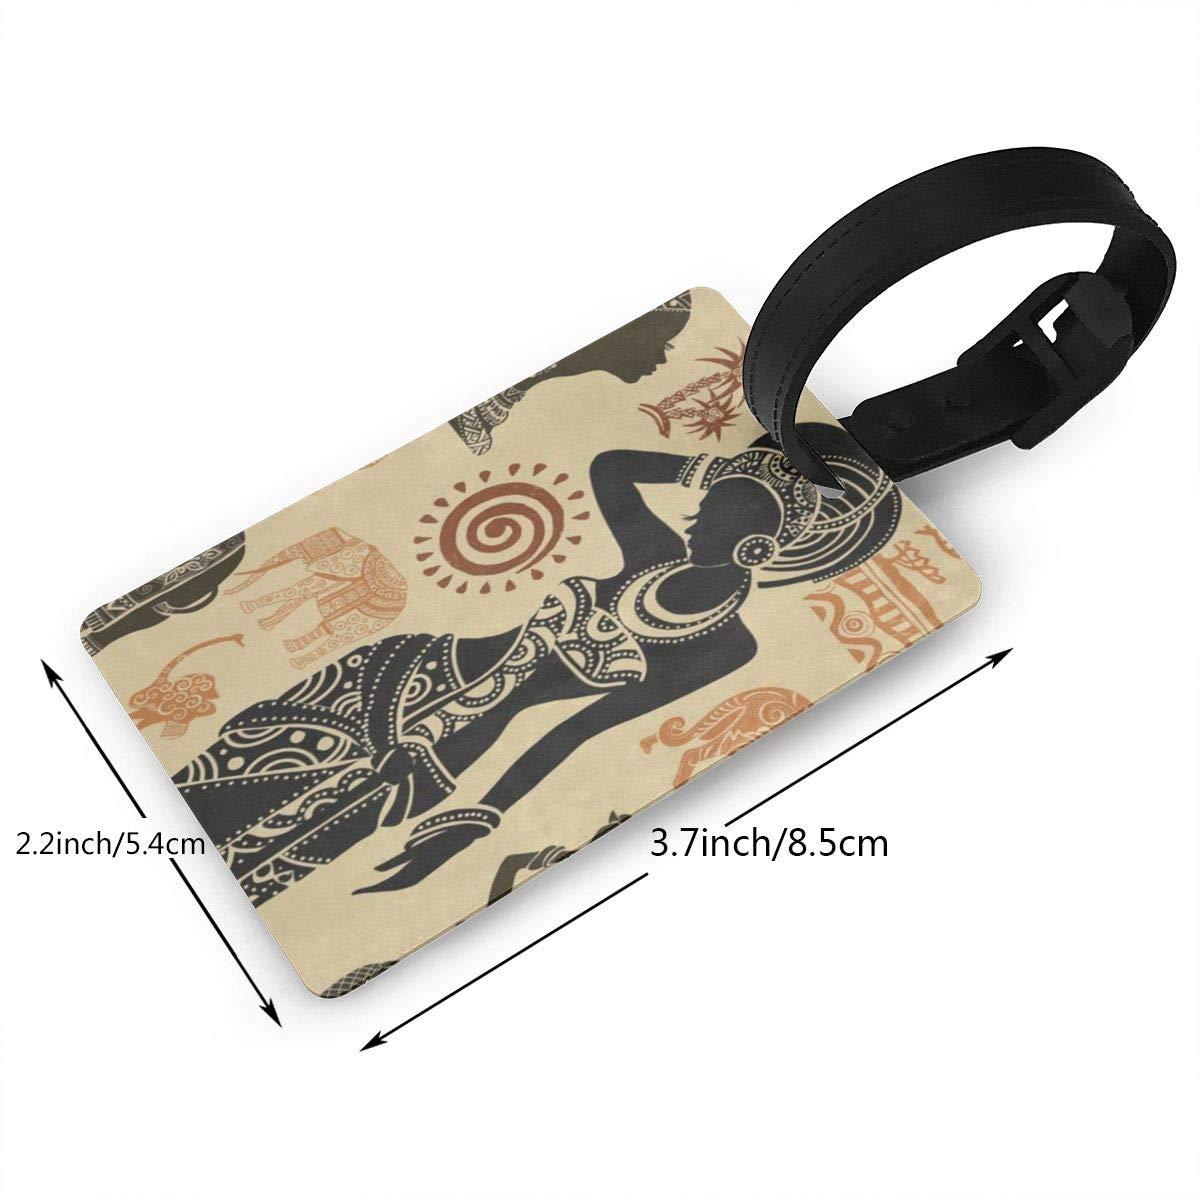 Luggage Tags African Women Mandala Bag Tag for Travel 2 PCS